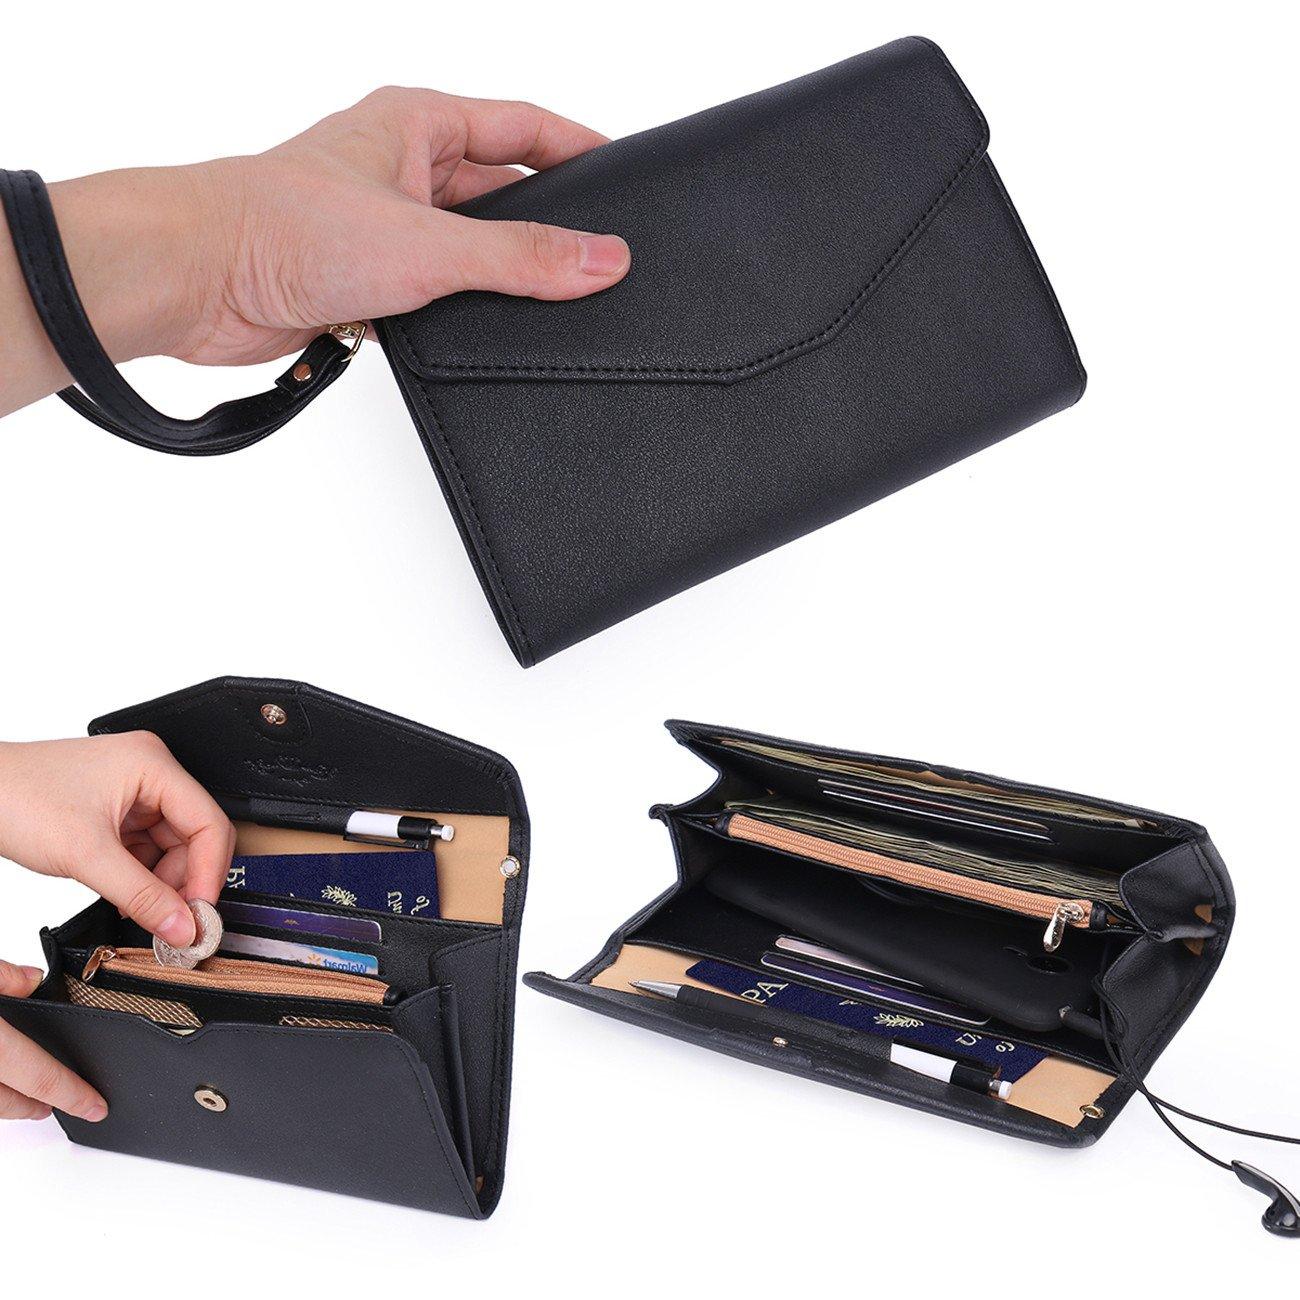 Zg Women Clutch Wallet Purse Wristlet, Passport Wallet, Cell Phone Clutch Wallet, All In One Purse Extra Capacity - Black by Zg gift